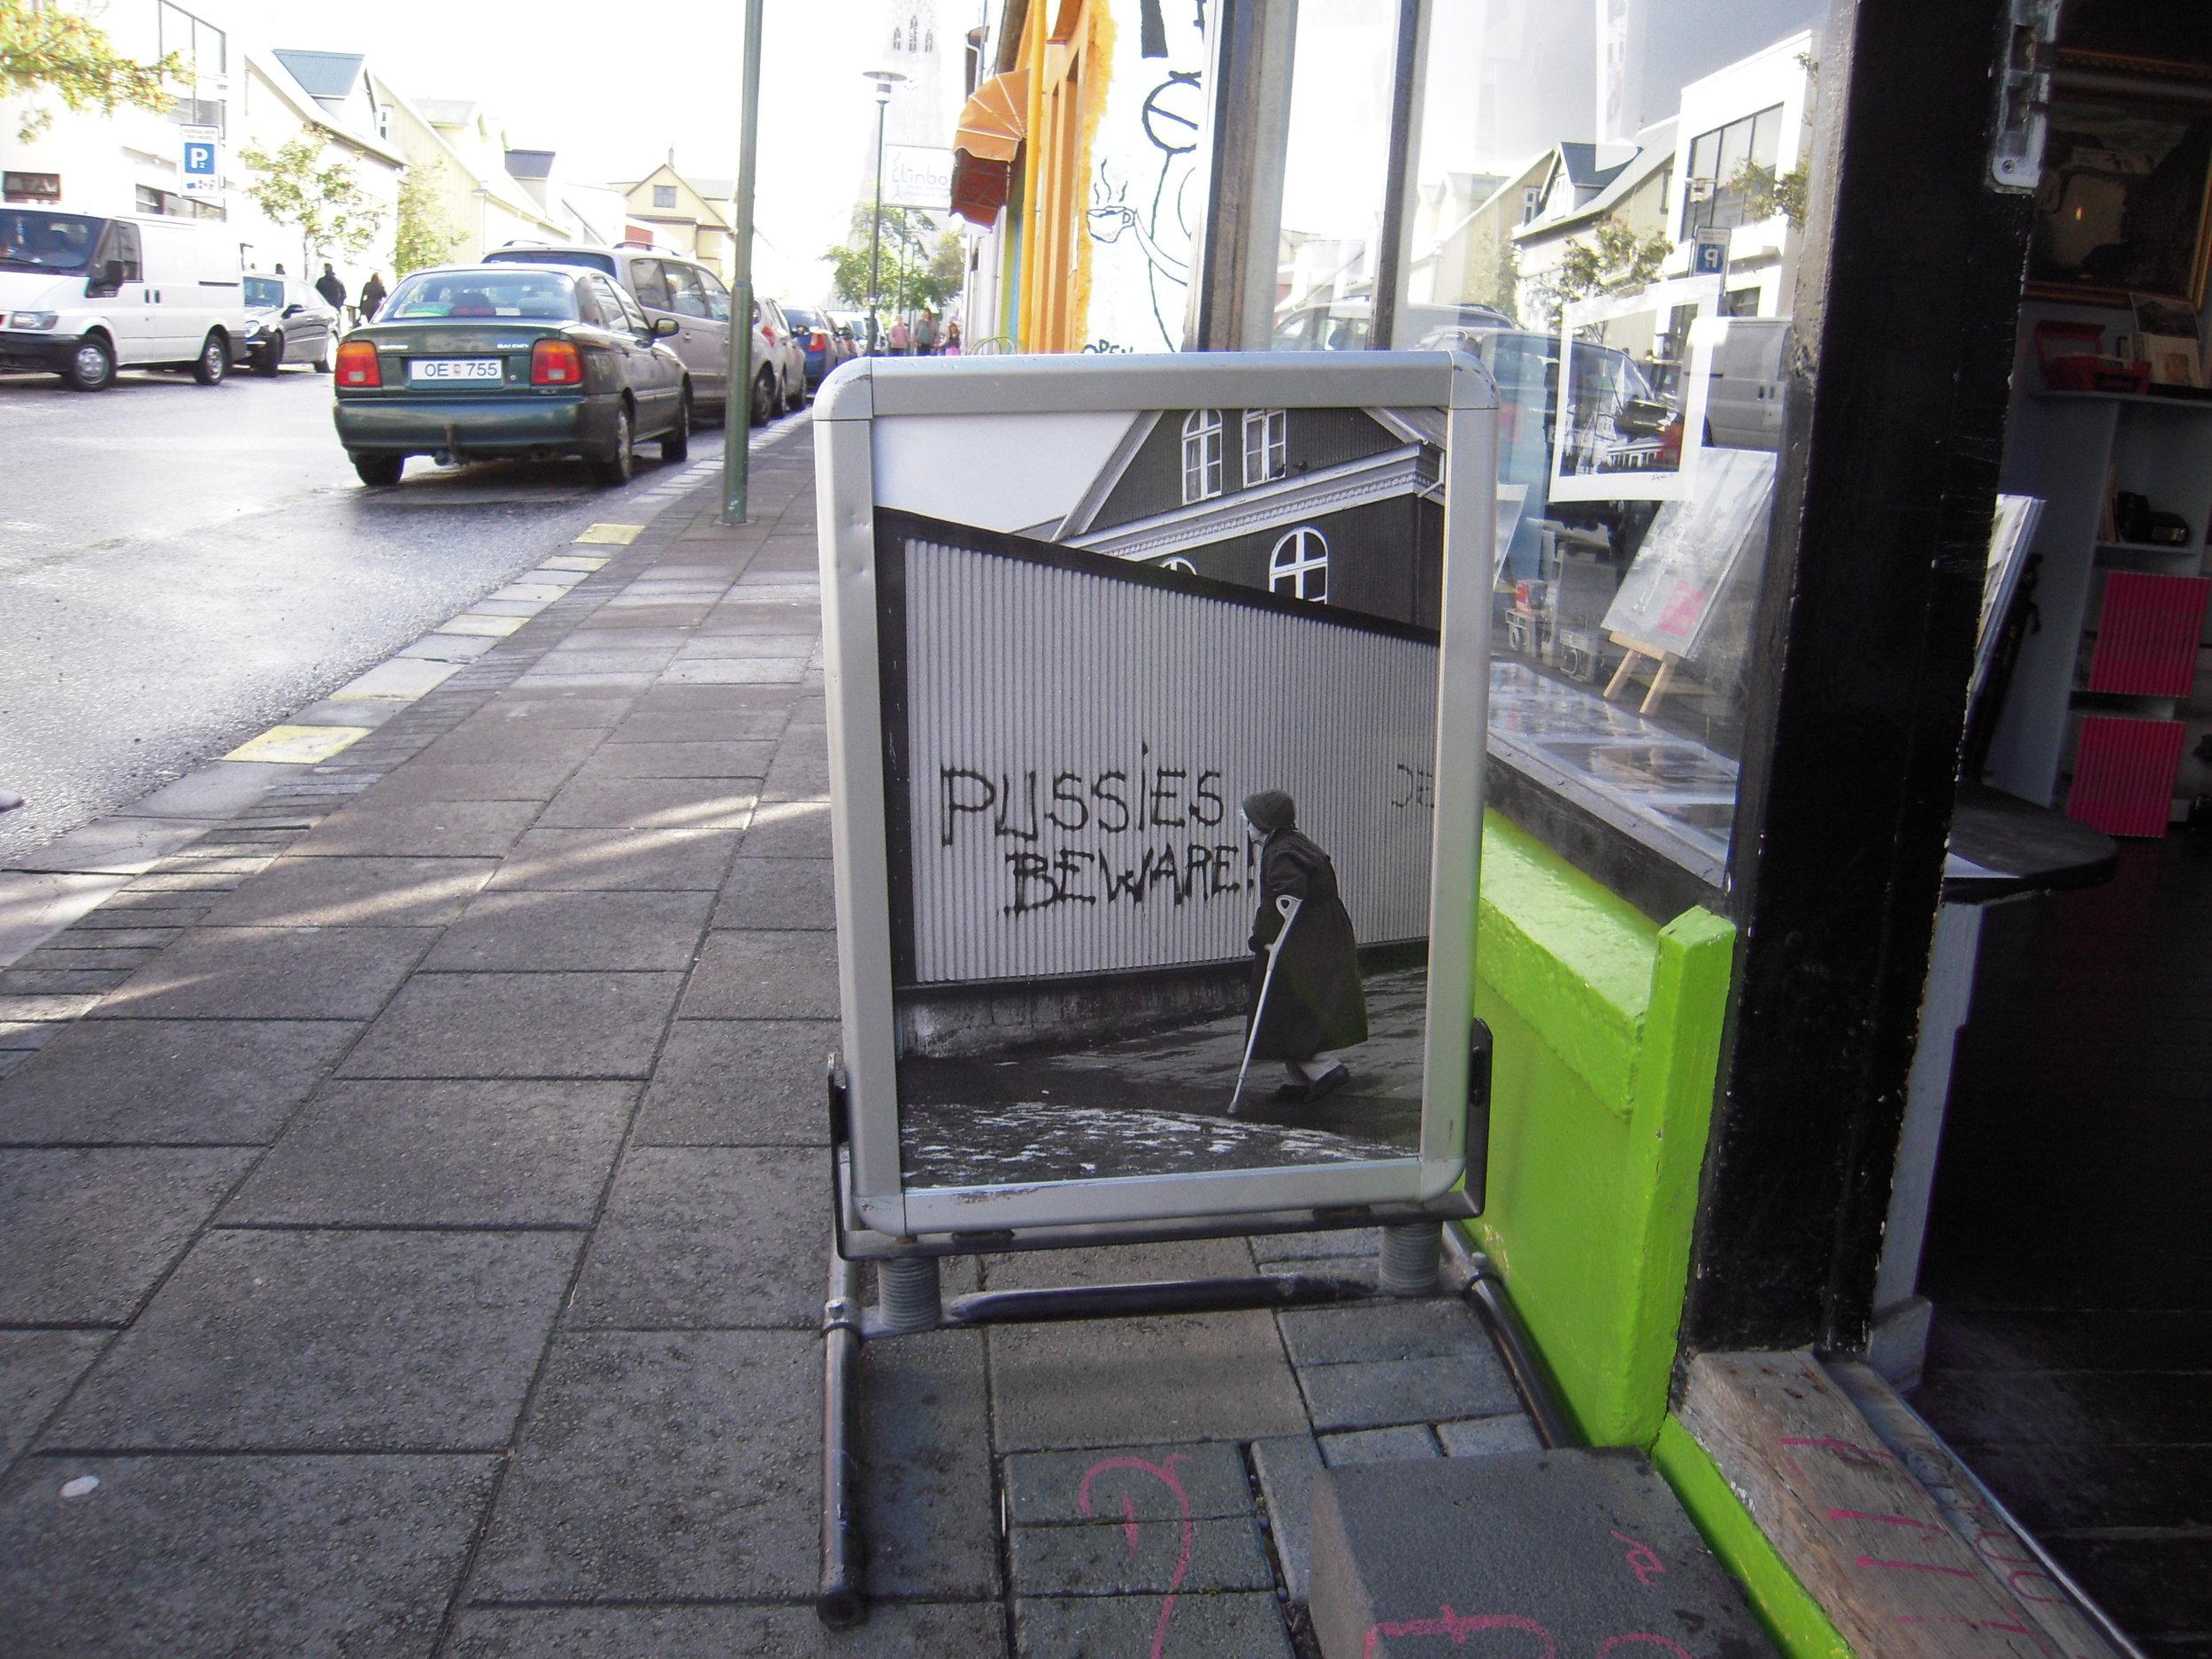 Street sign in Reykjavik.